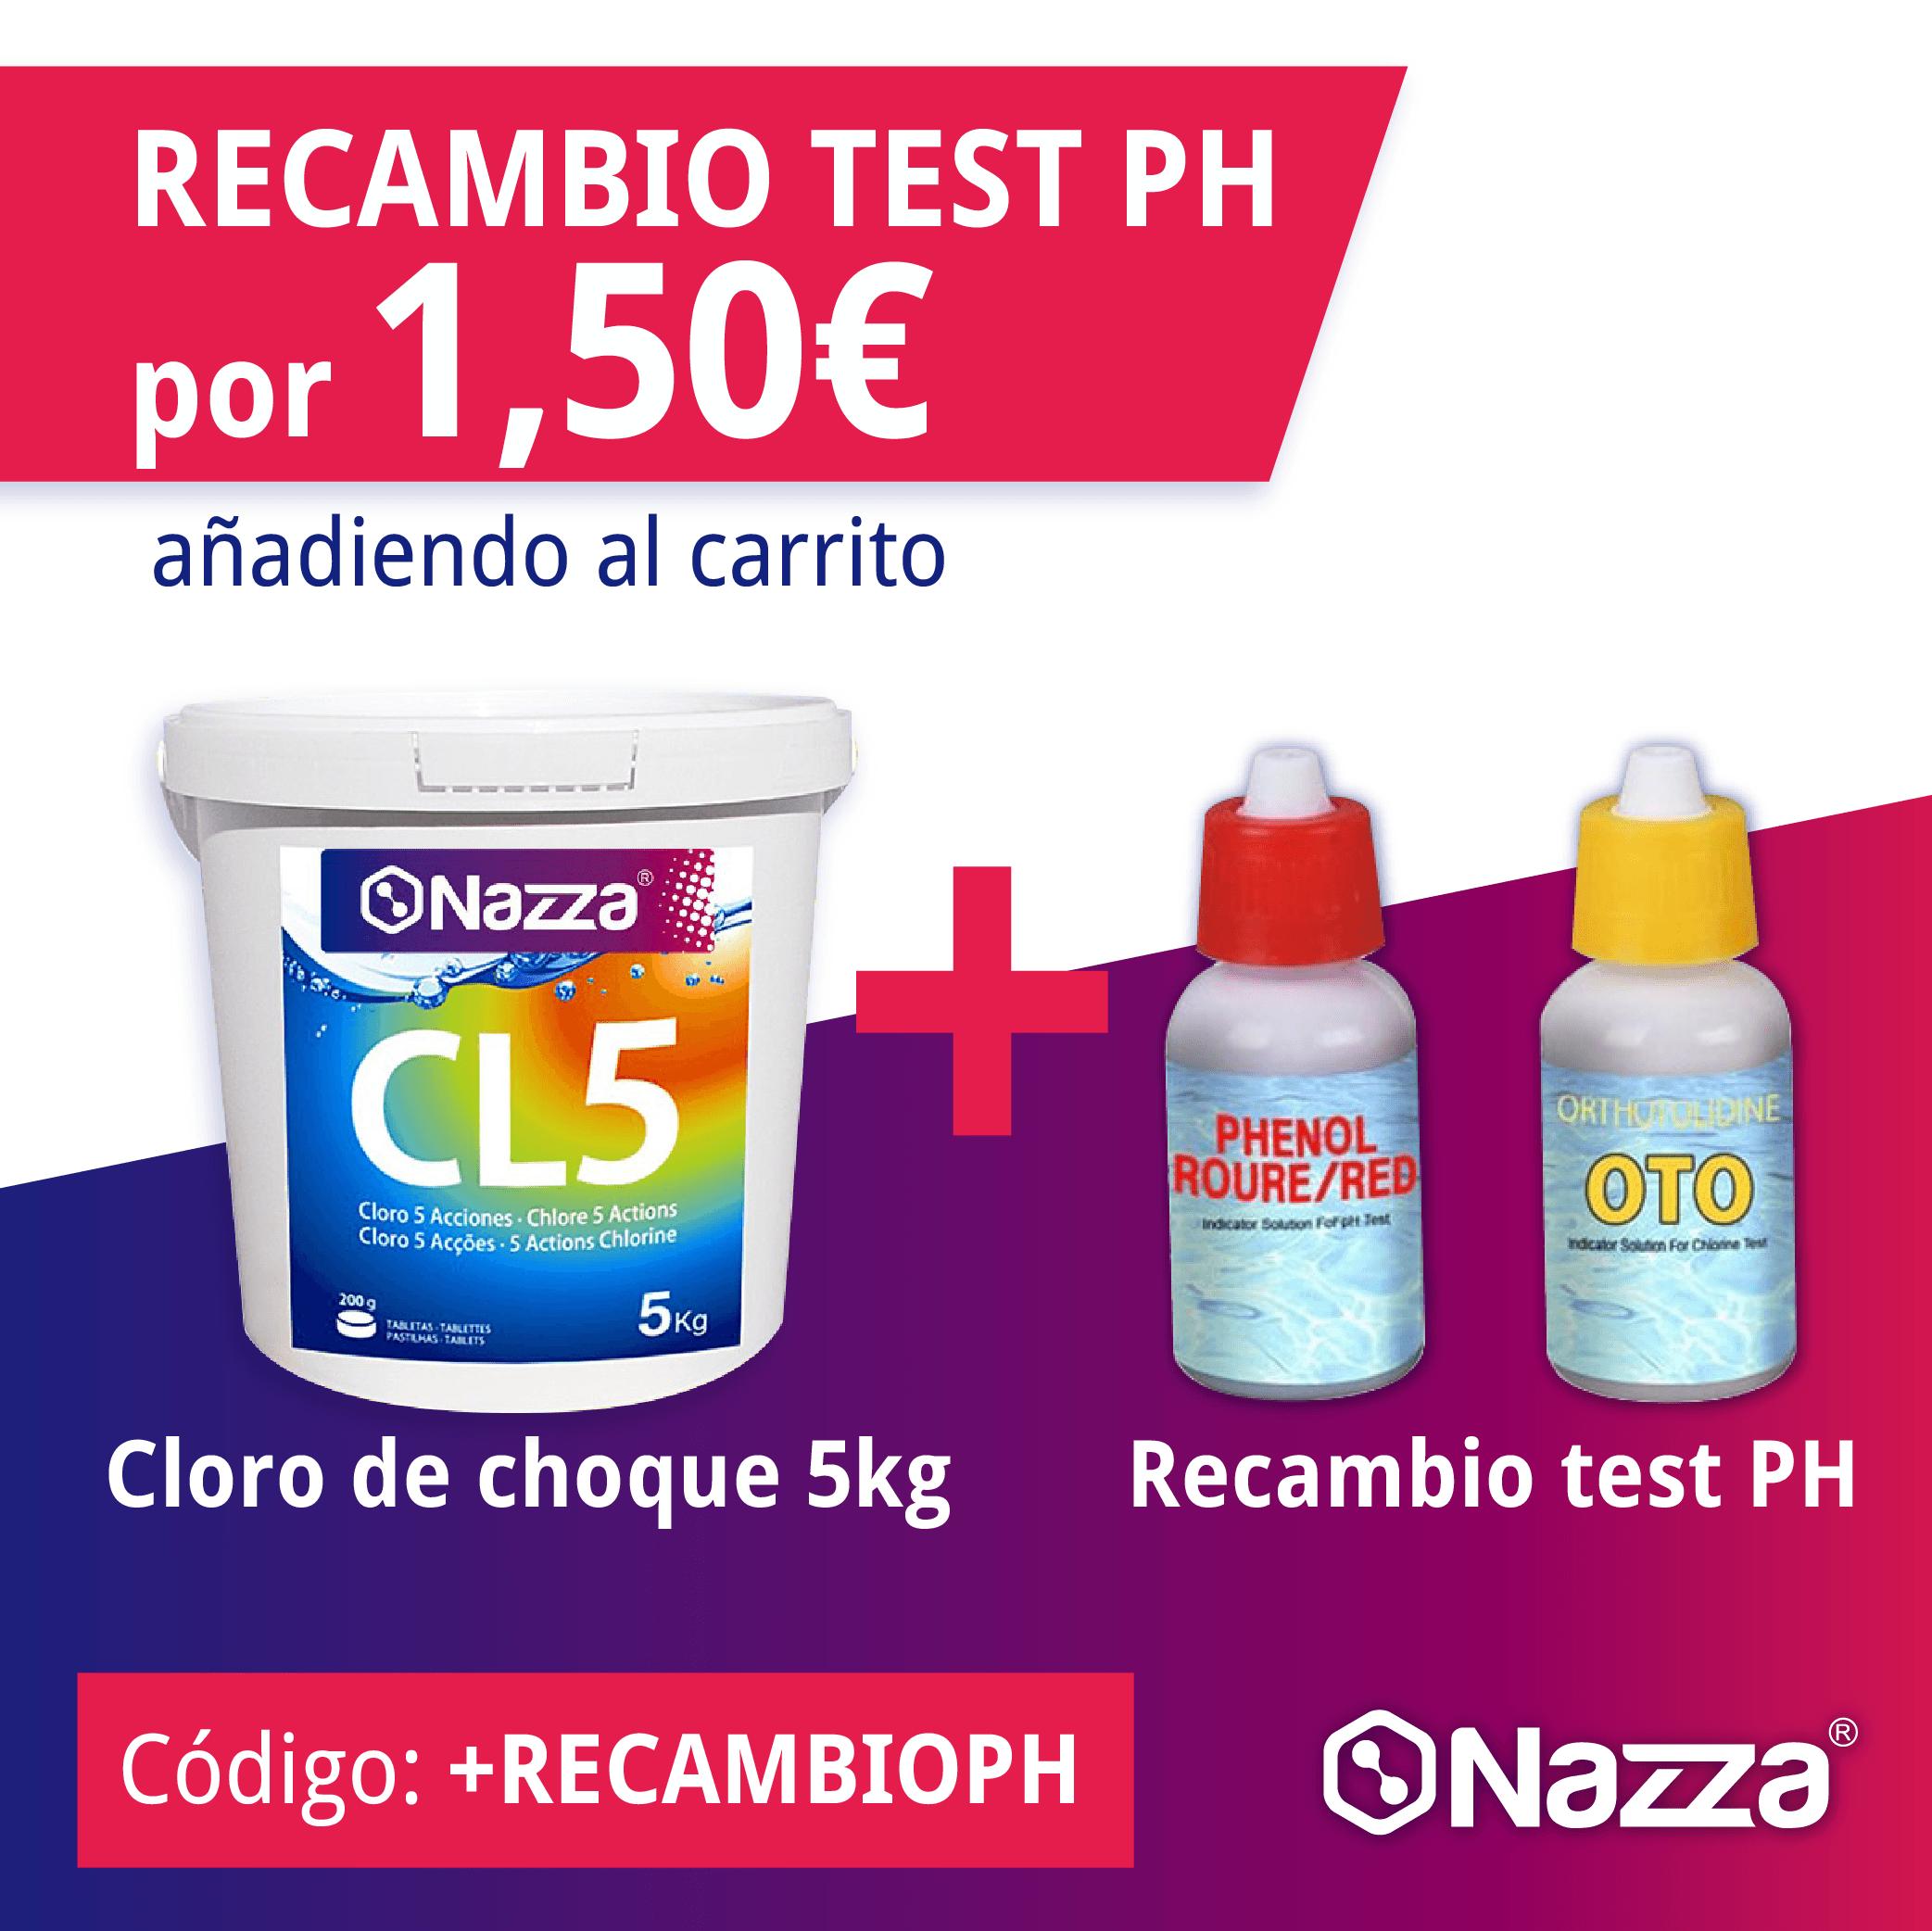 recambio test ph 1,50€